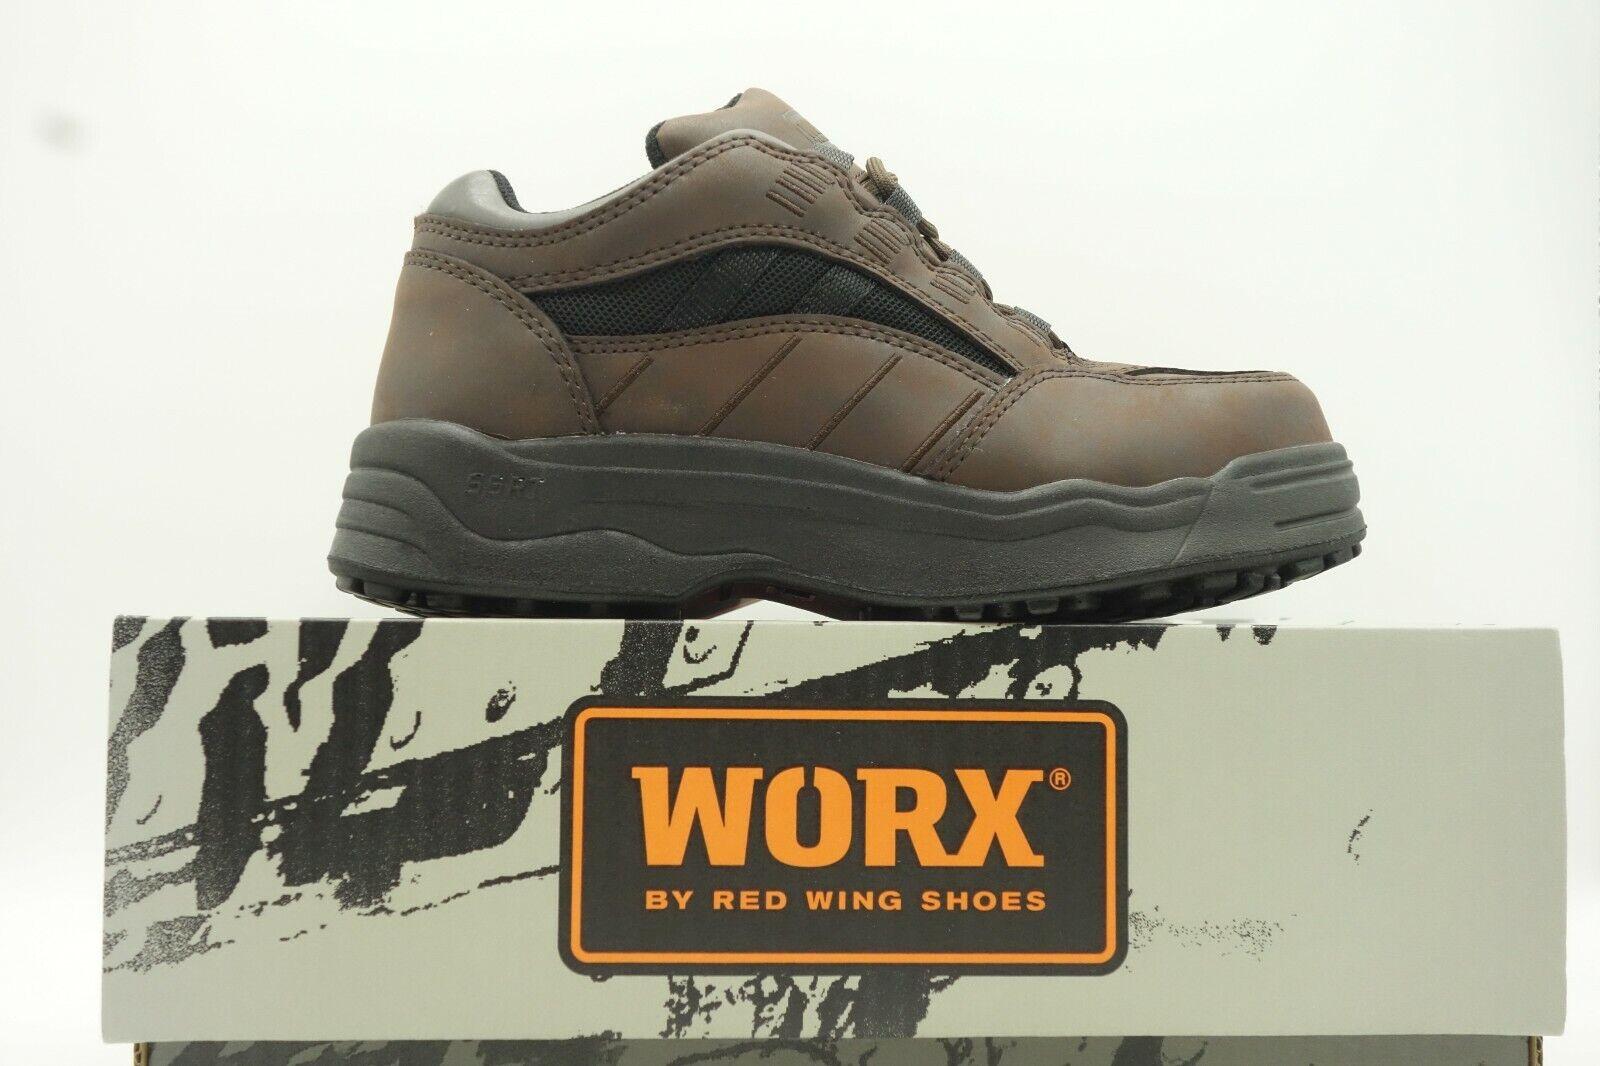 rot Wing schuhe Worx braun Leather Steel Toe Lace Up Work schuhe damen 6.5 WW